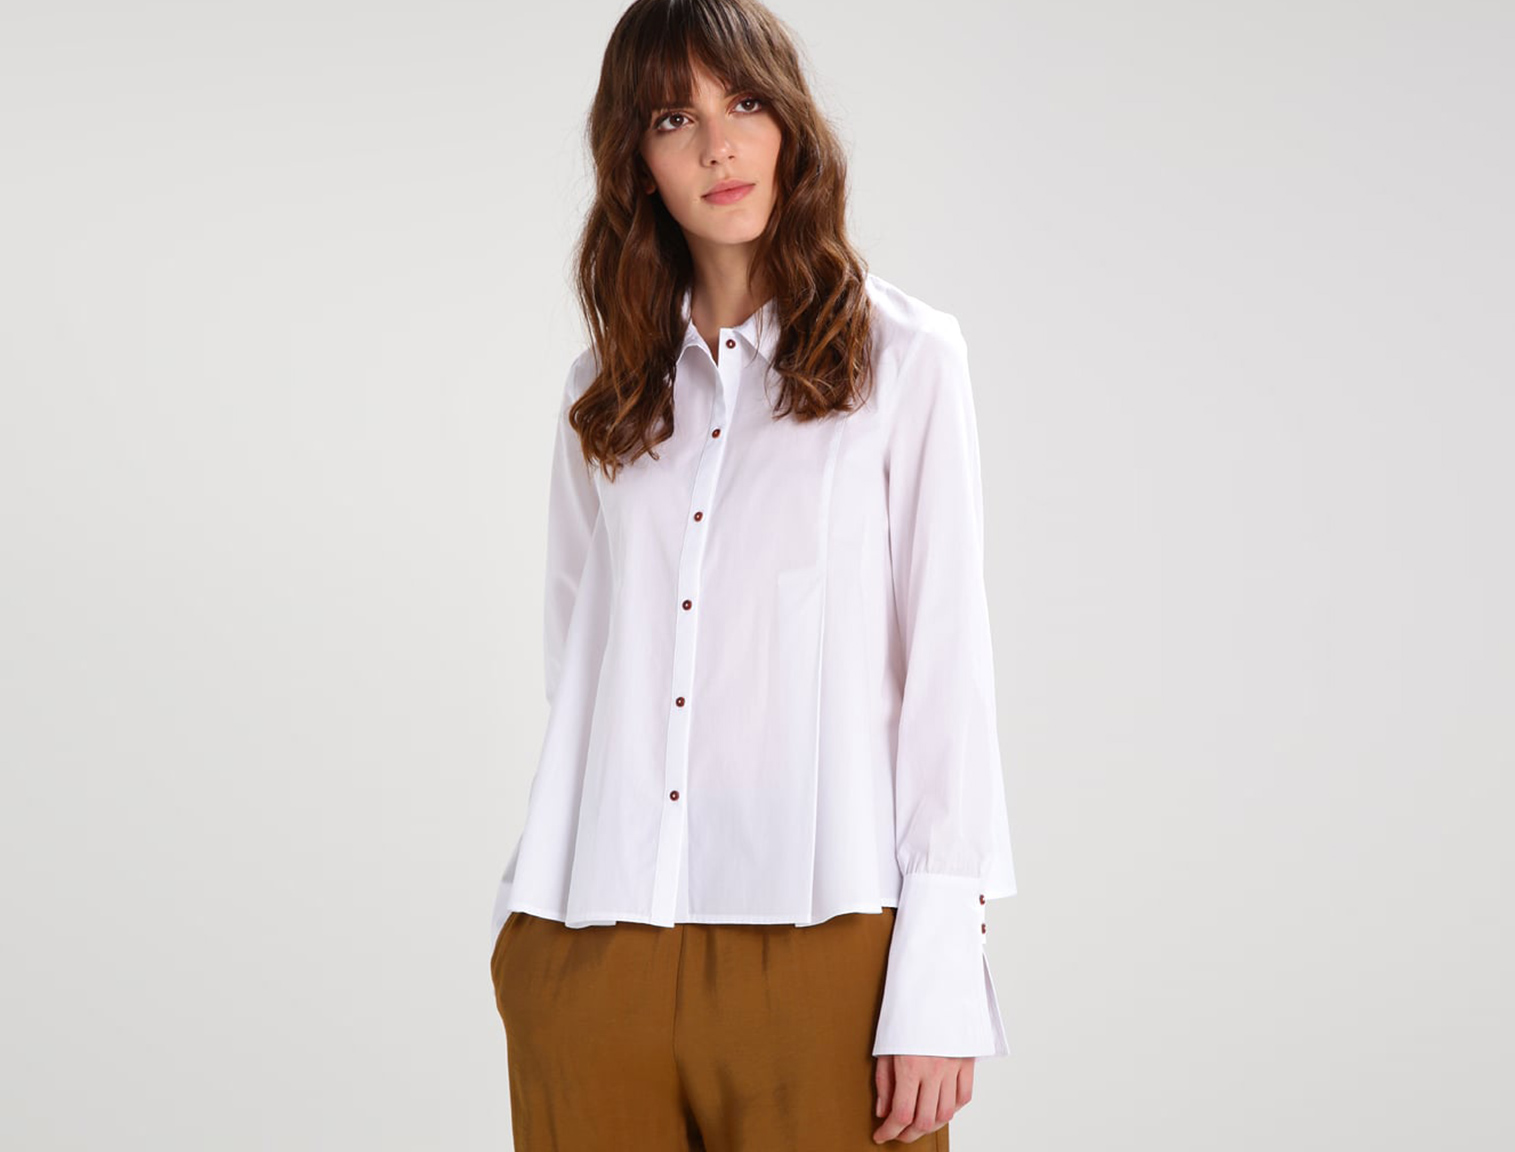 Mujer con camisa blanca